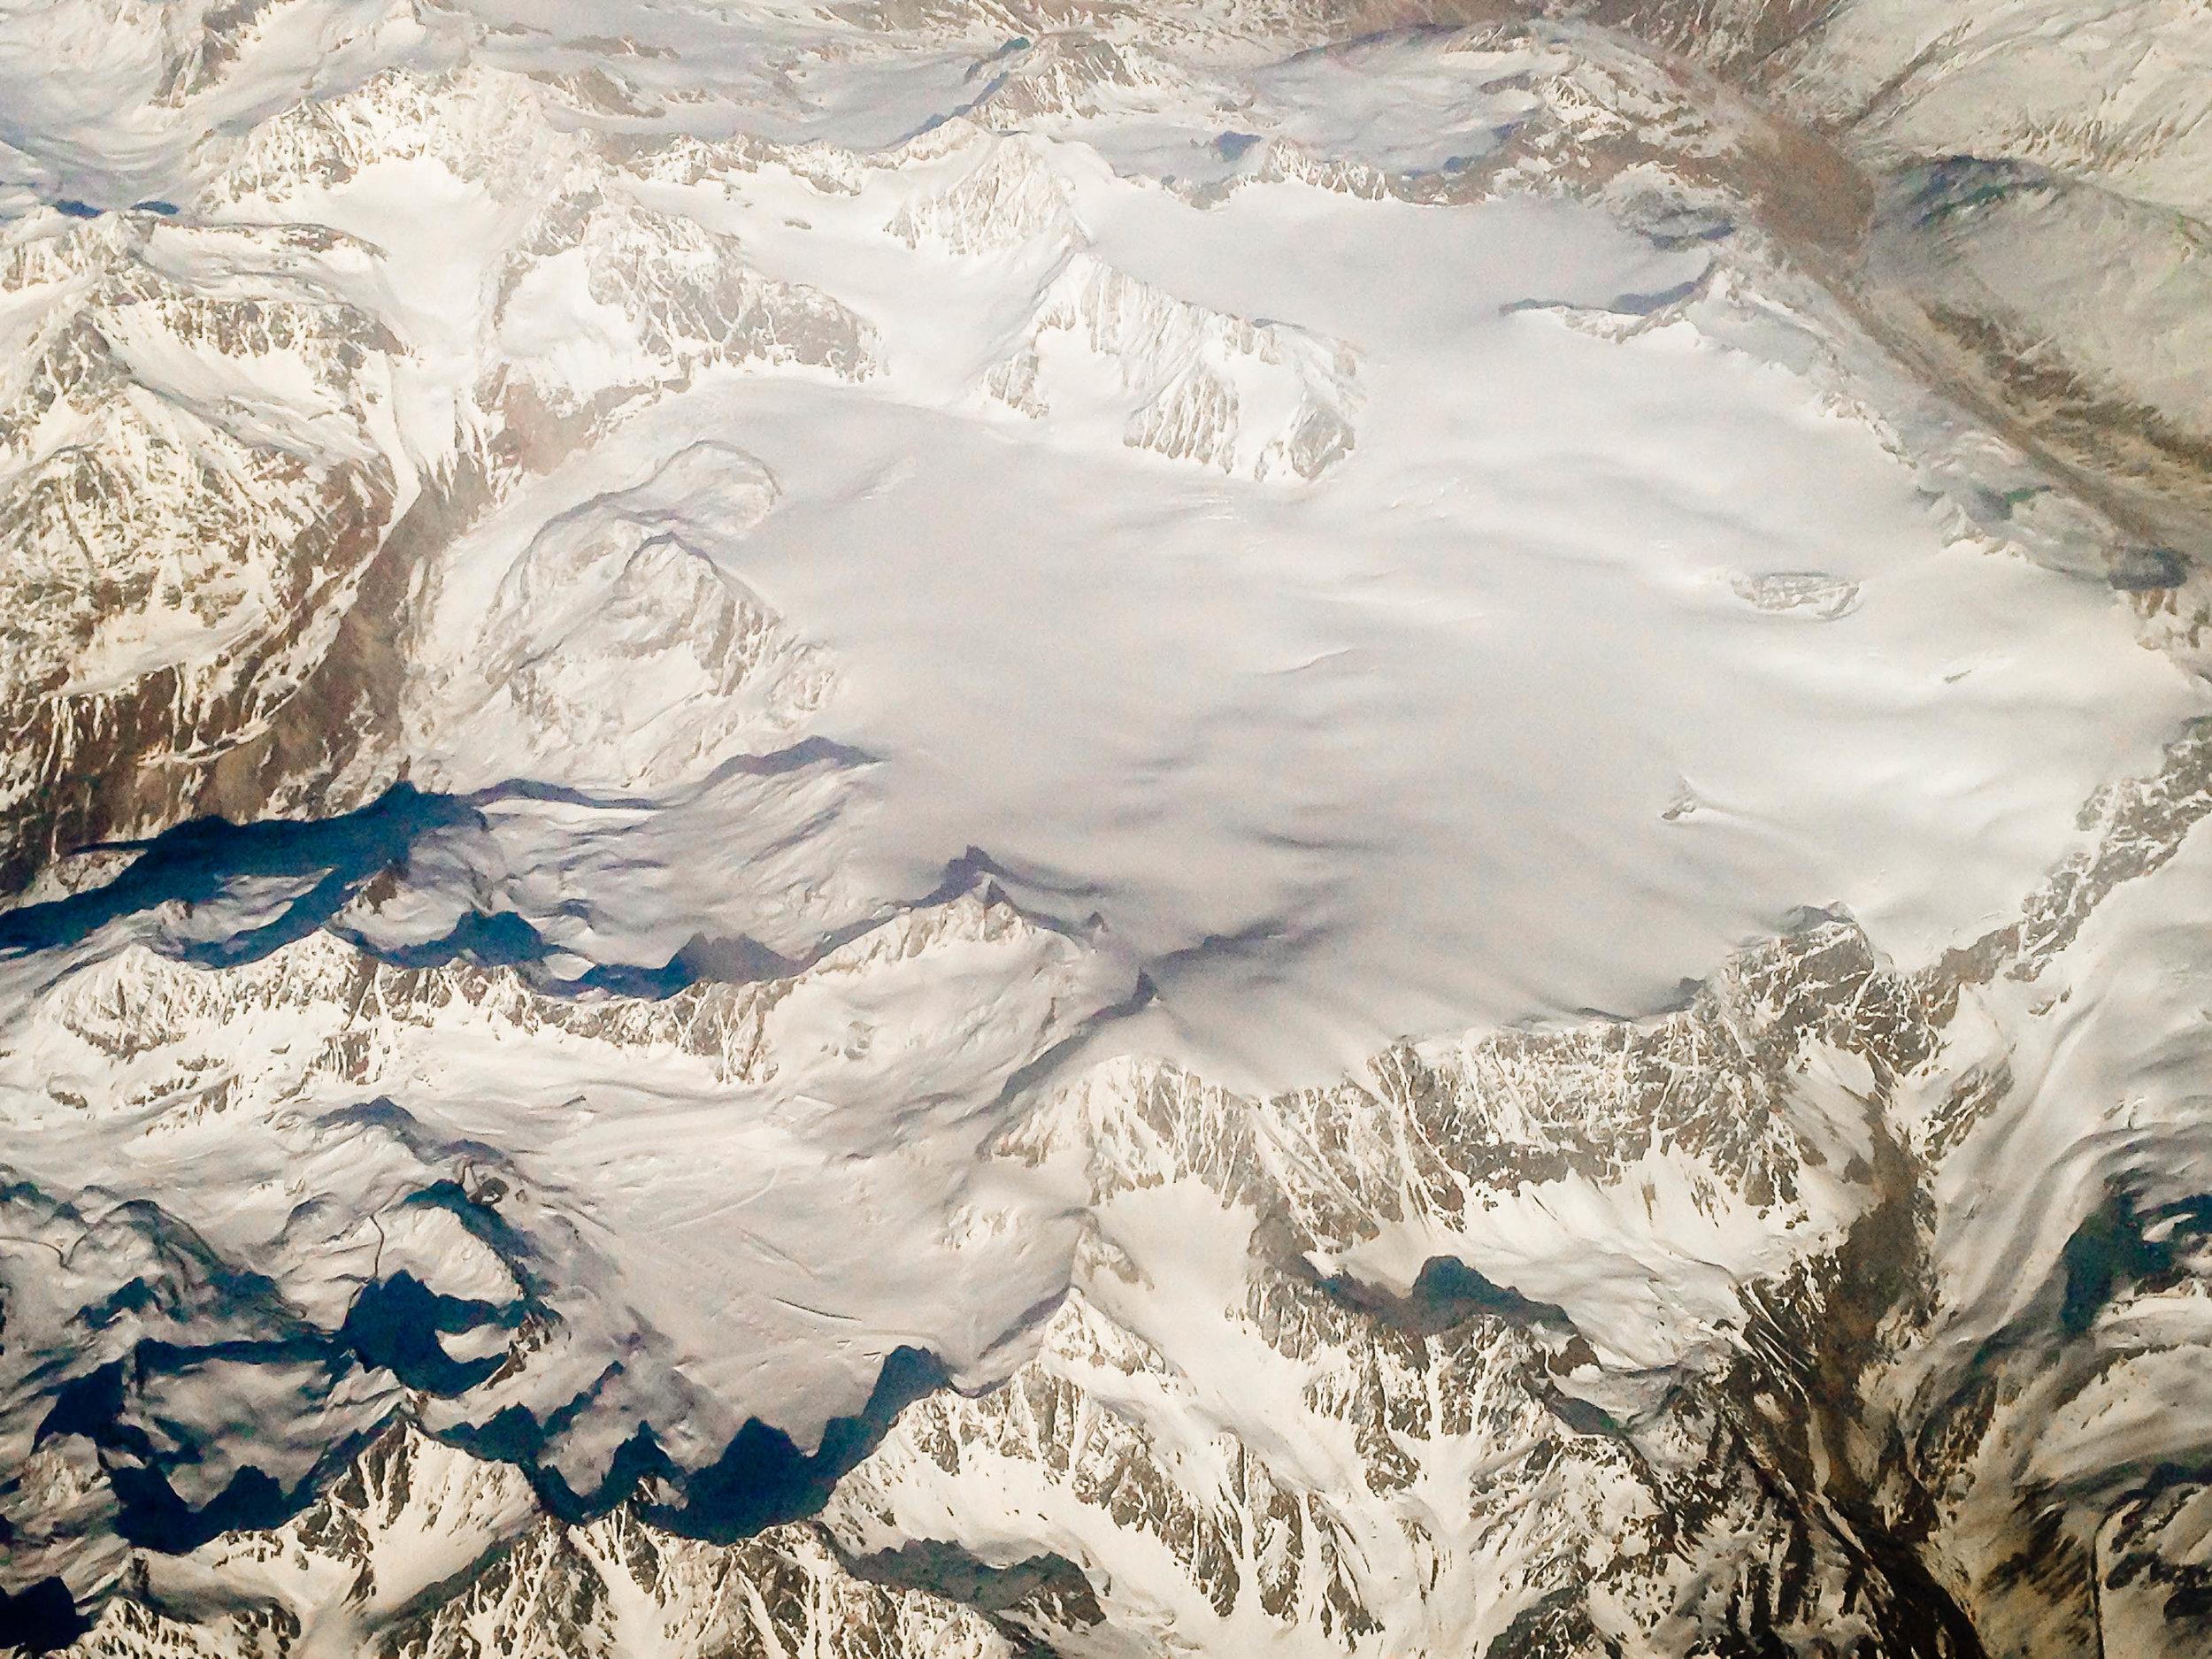 iphone image from Aeroplane- Malles Venosta, Italy